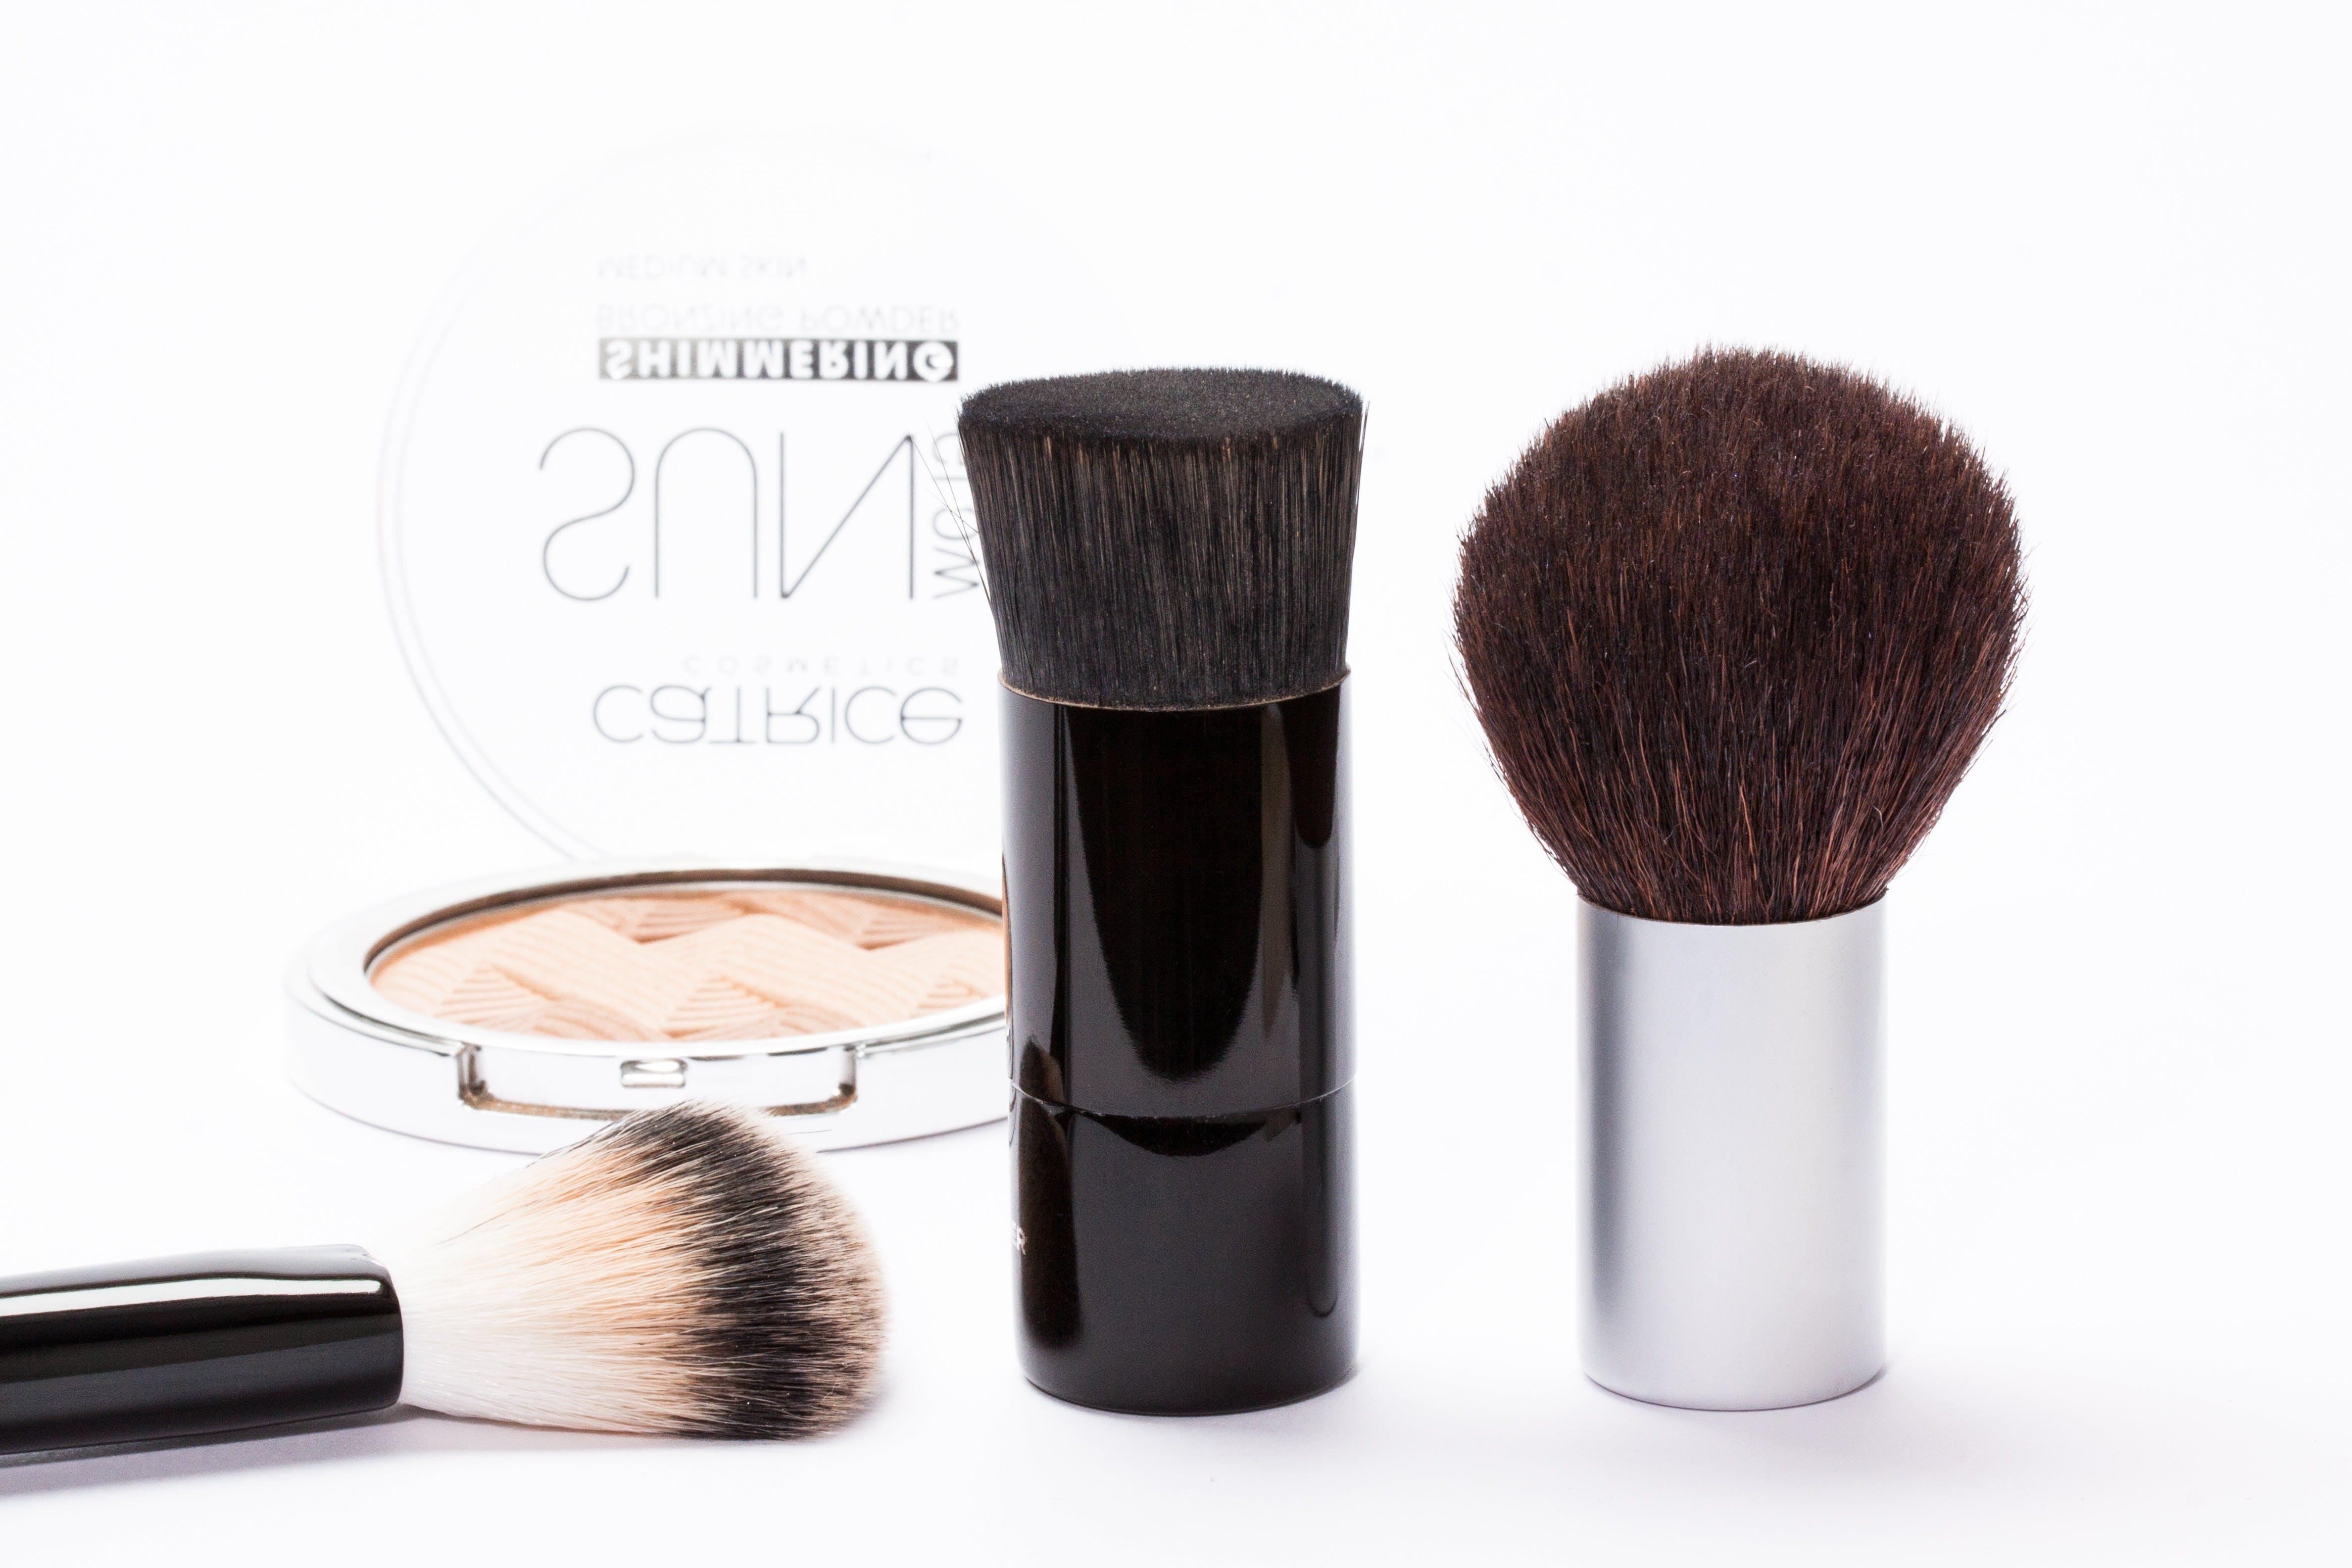 Black Make Up Brush Near Silver Make Up Palette